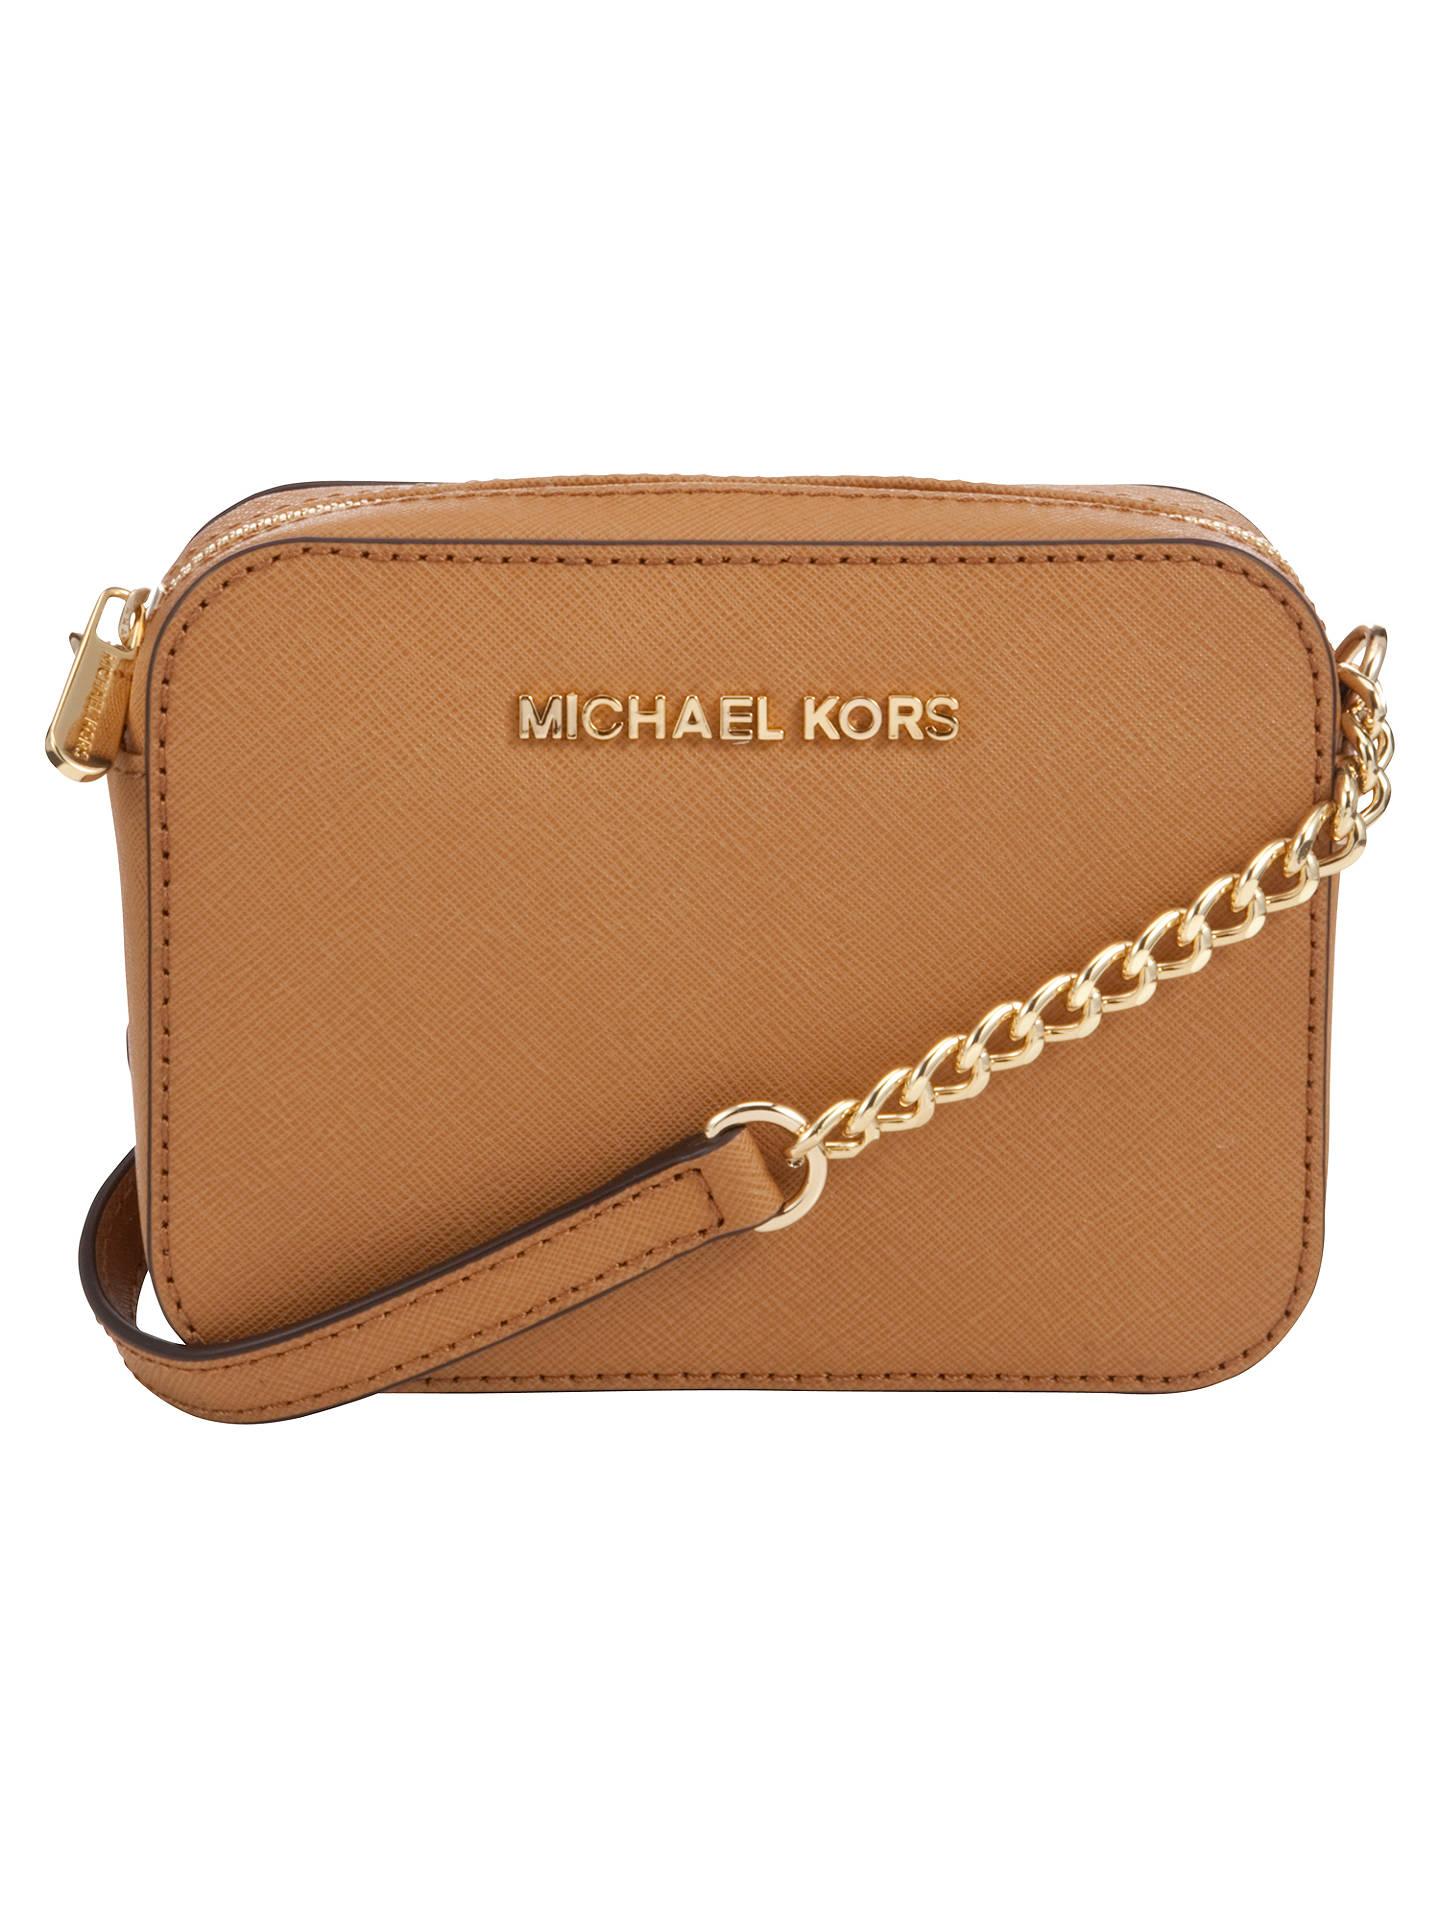 14c9f90bd04c9c Buy MICHAEL Michael Kors Jet Set Travel Leather Crossbody Bag, Peanut  Online at johnlewis.